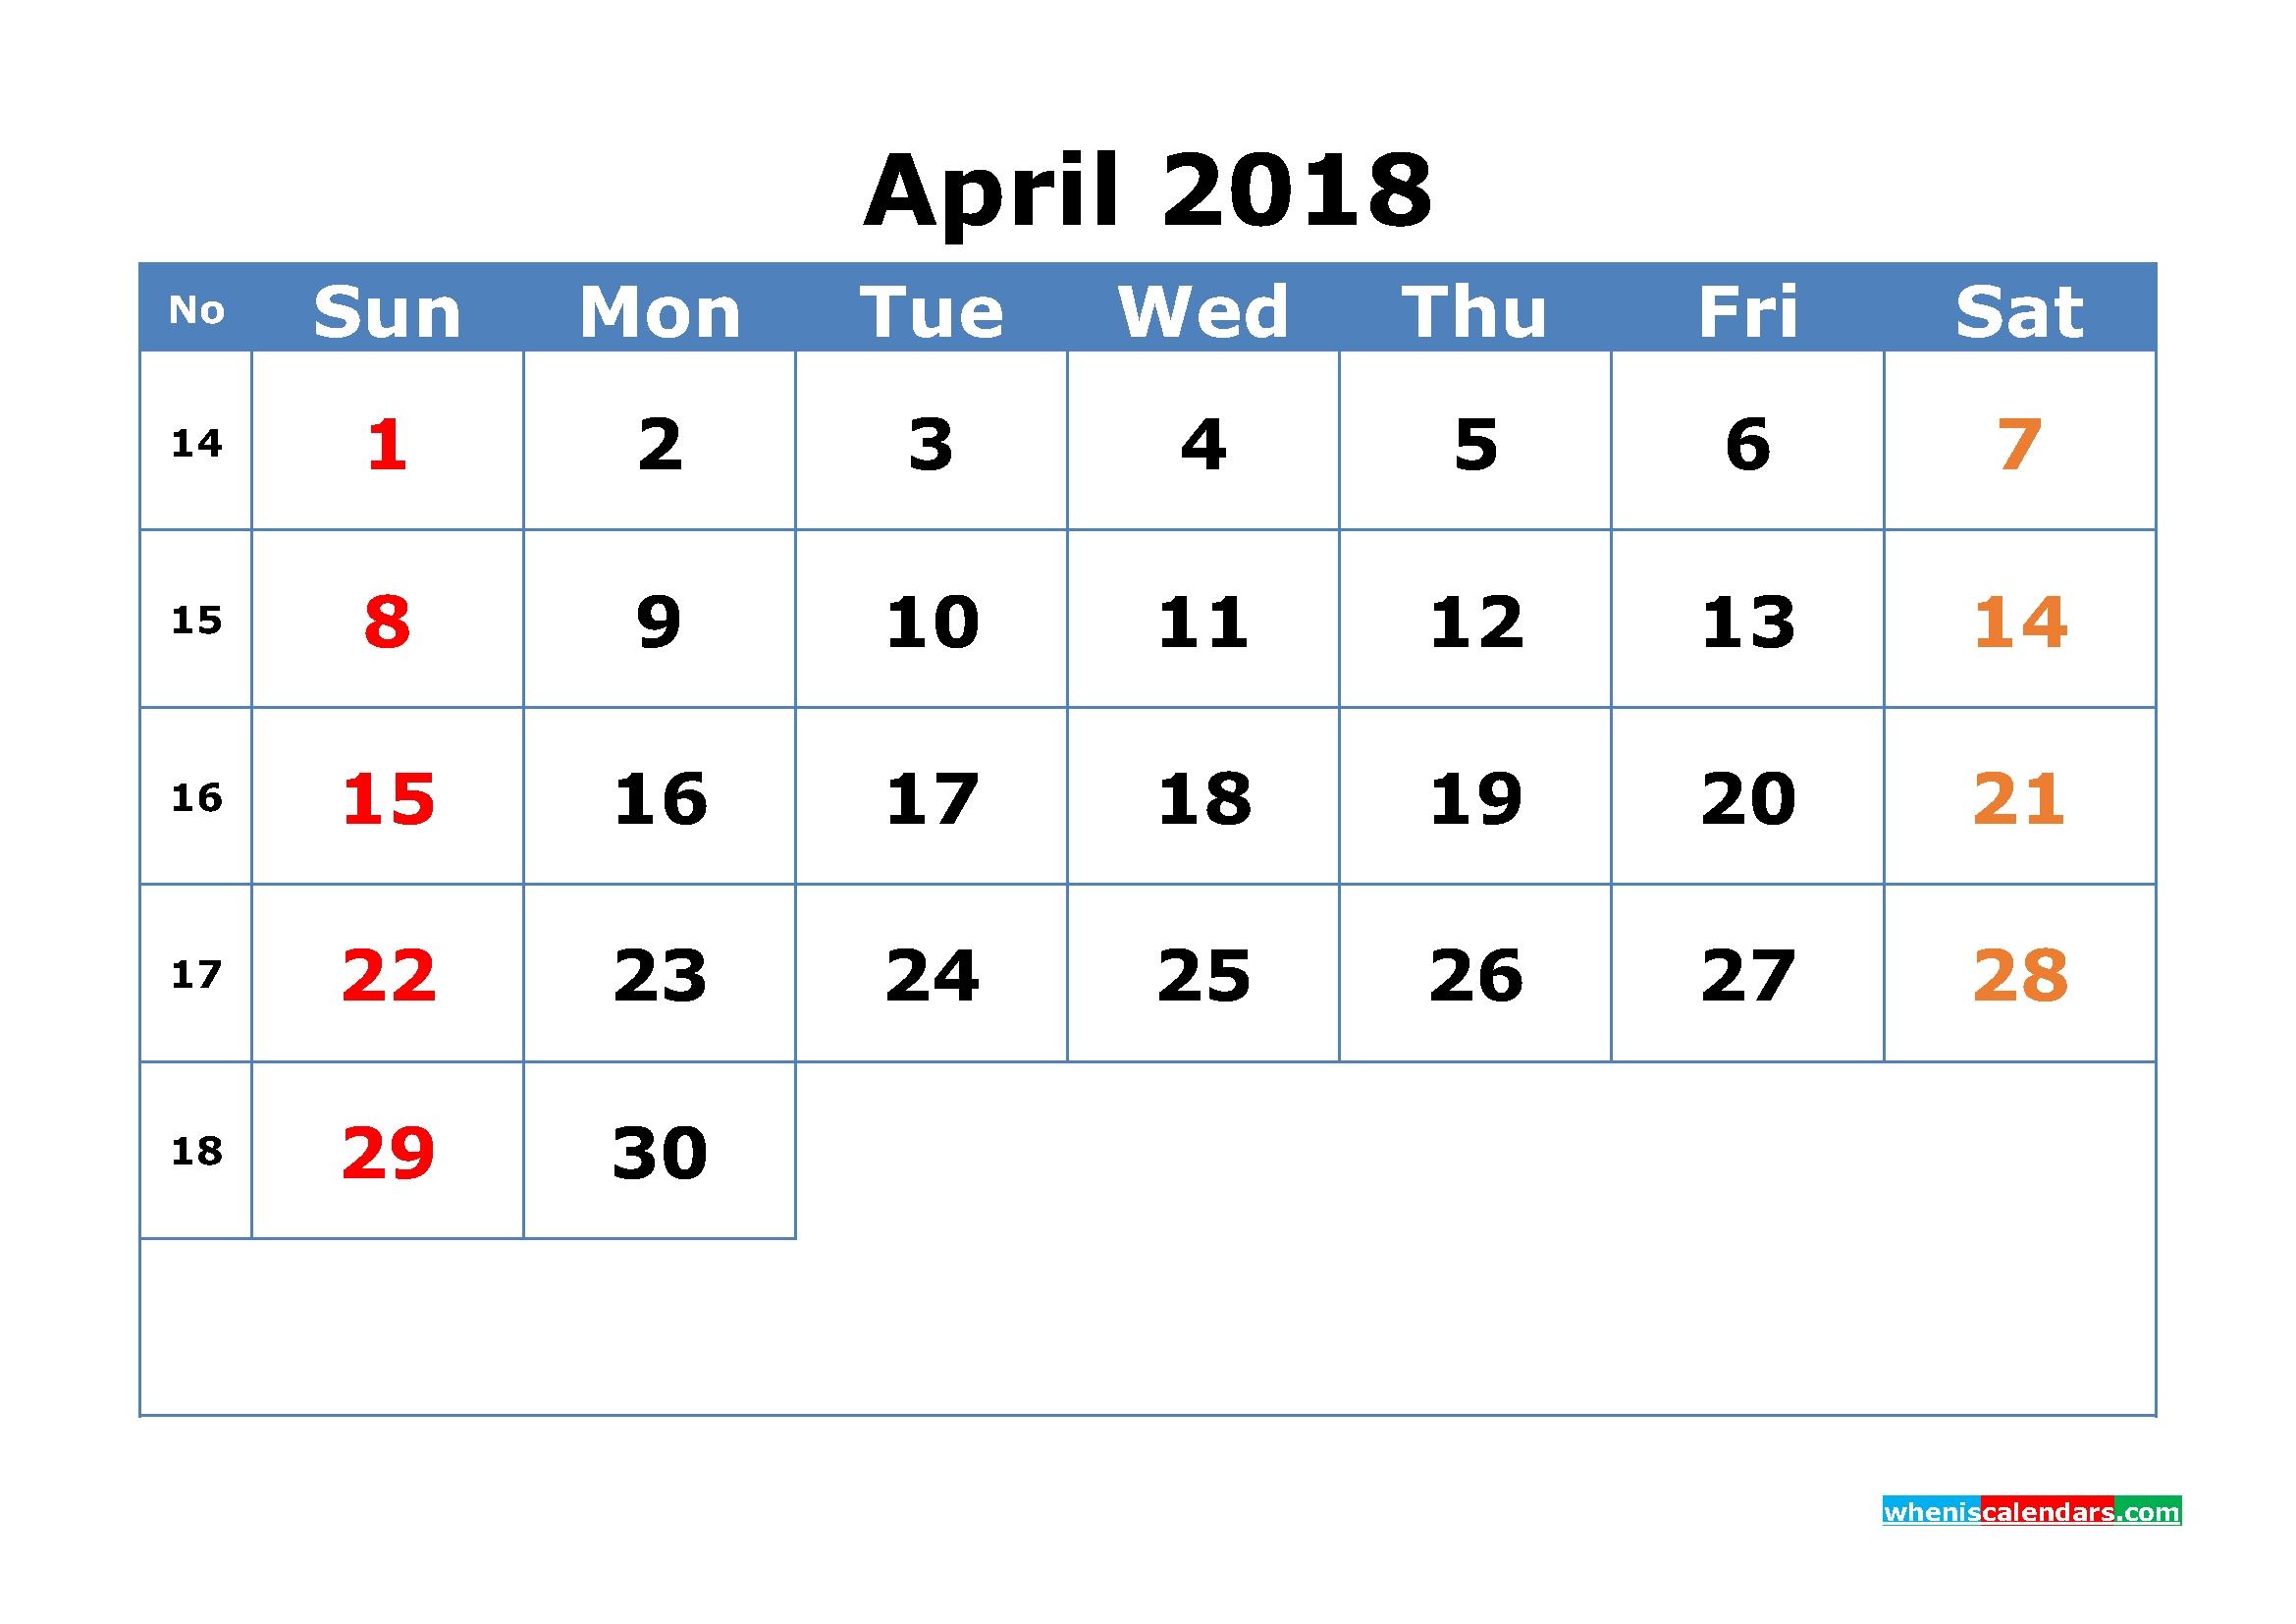 Calendar By Week Numbers 2018 – Template Calendar Design